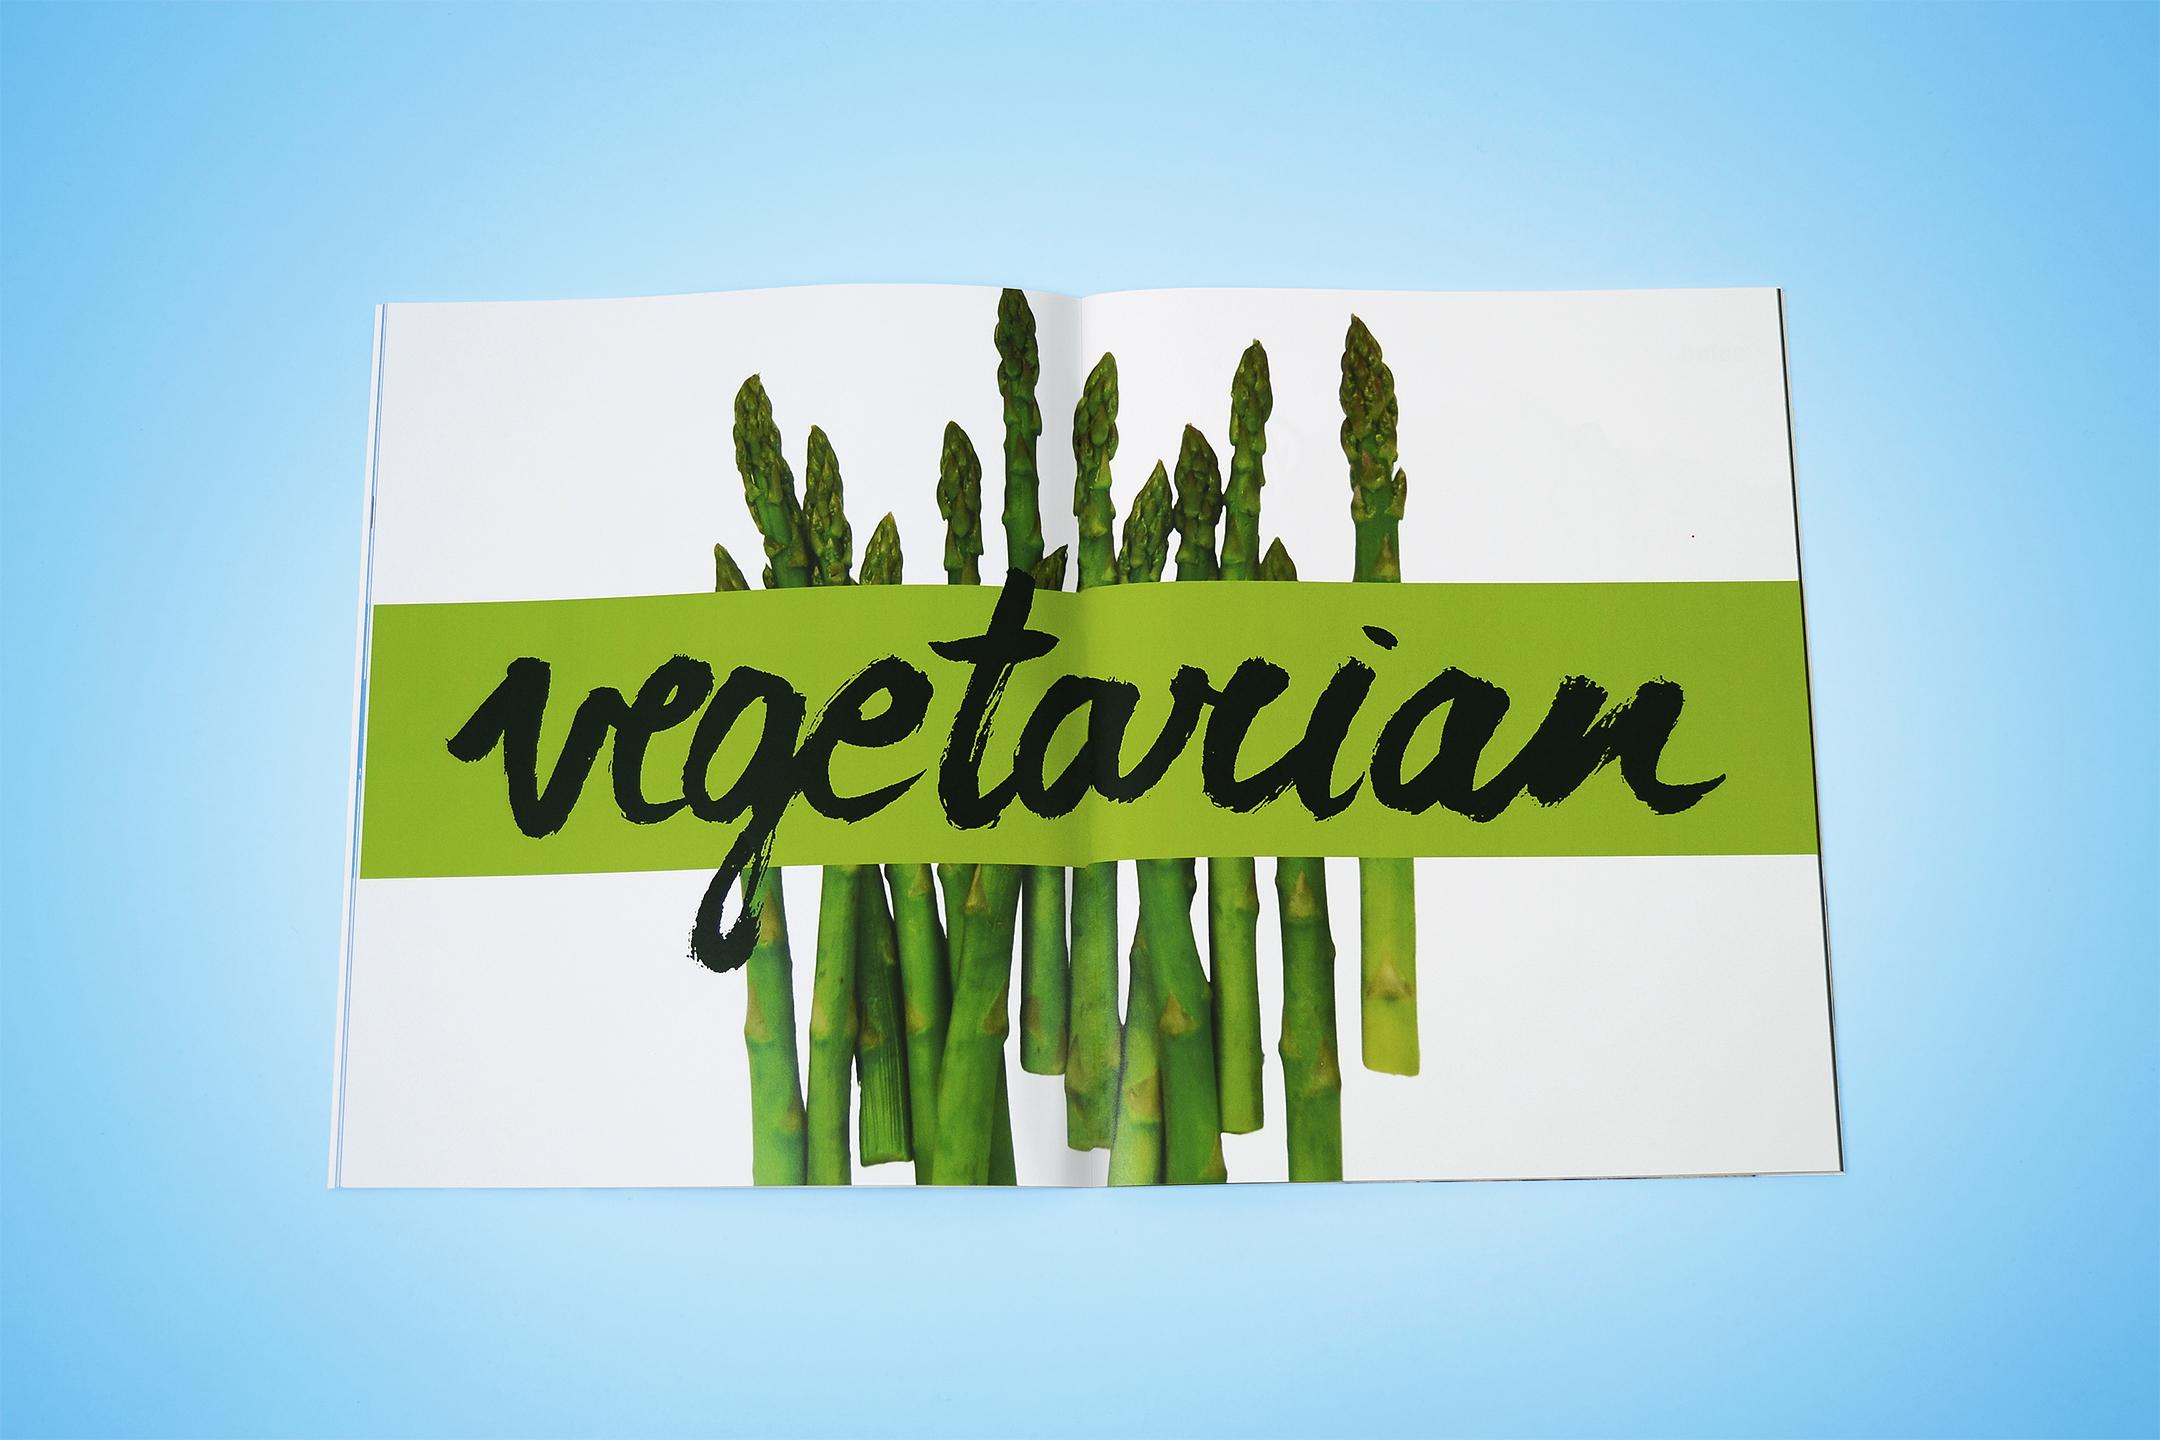 7vegetarian_cover.jpg